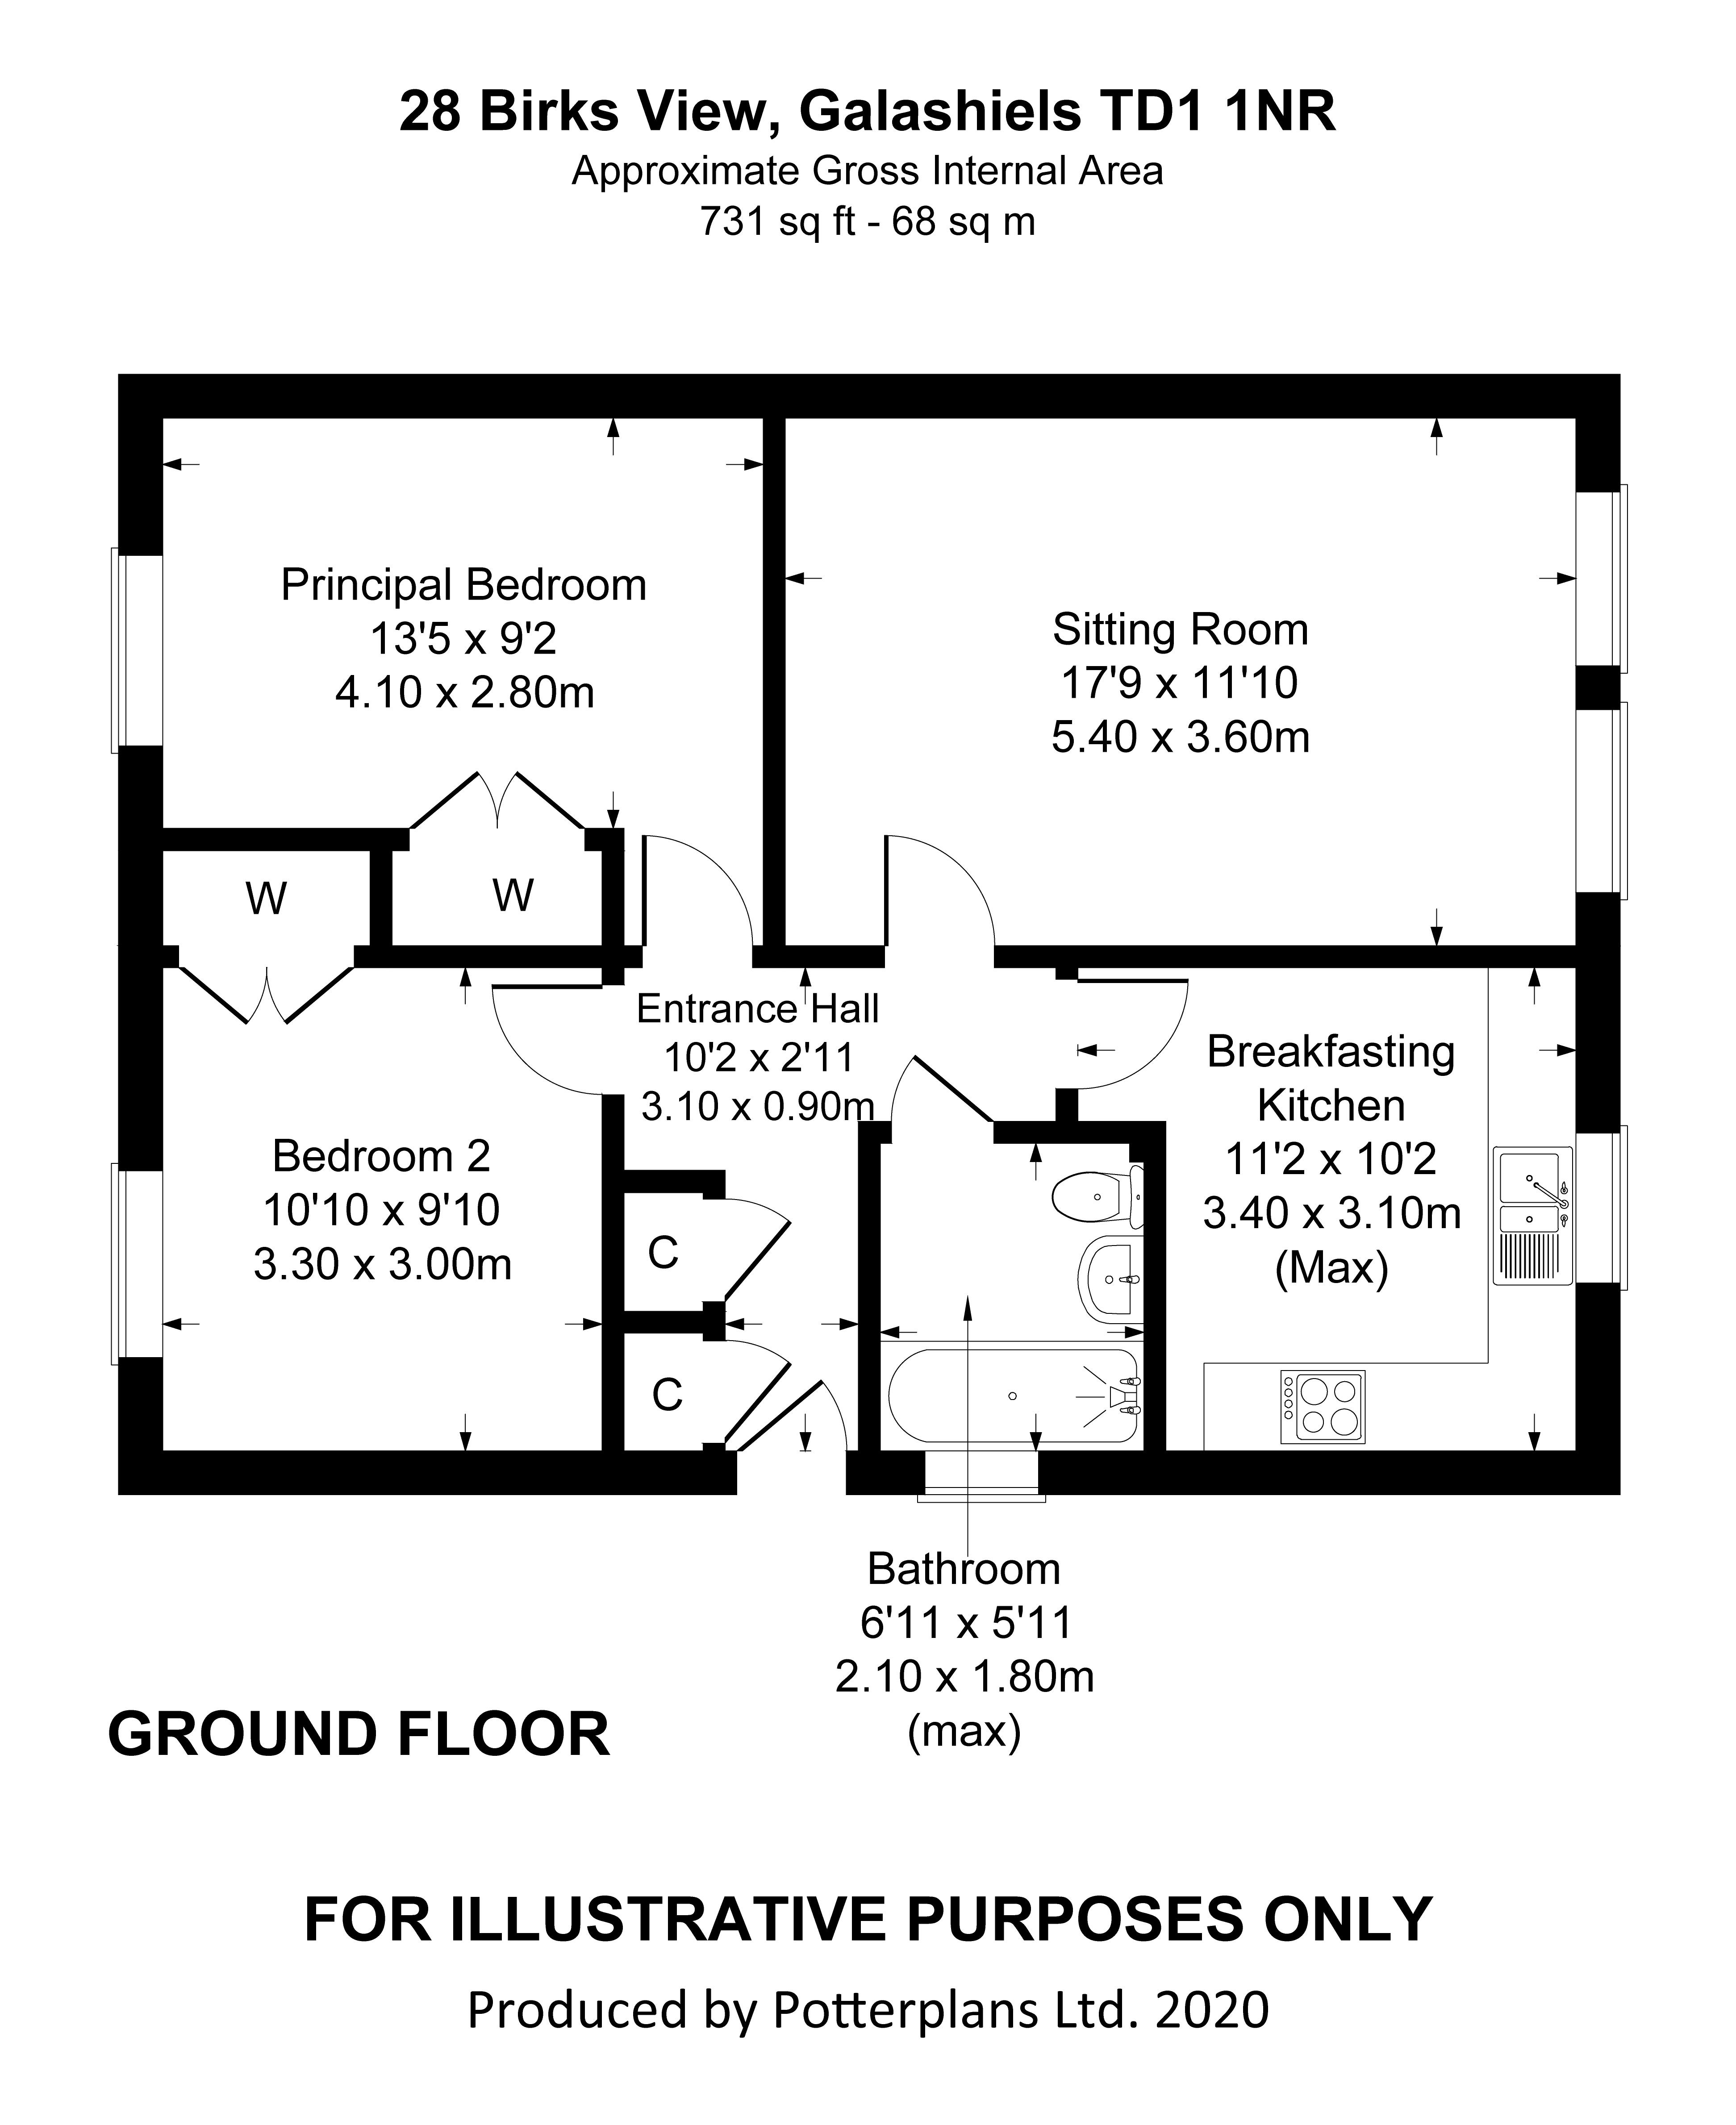 28 Birks View Floorplan